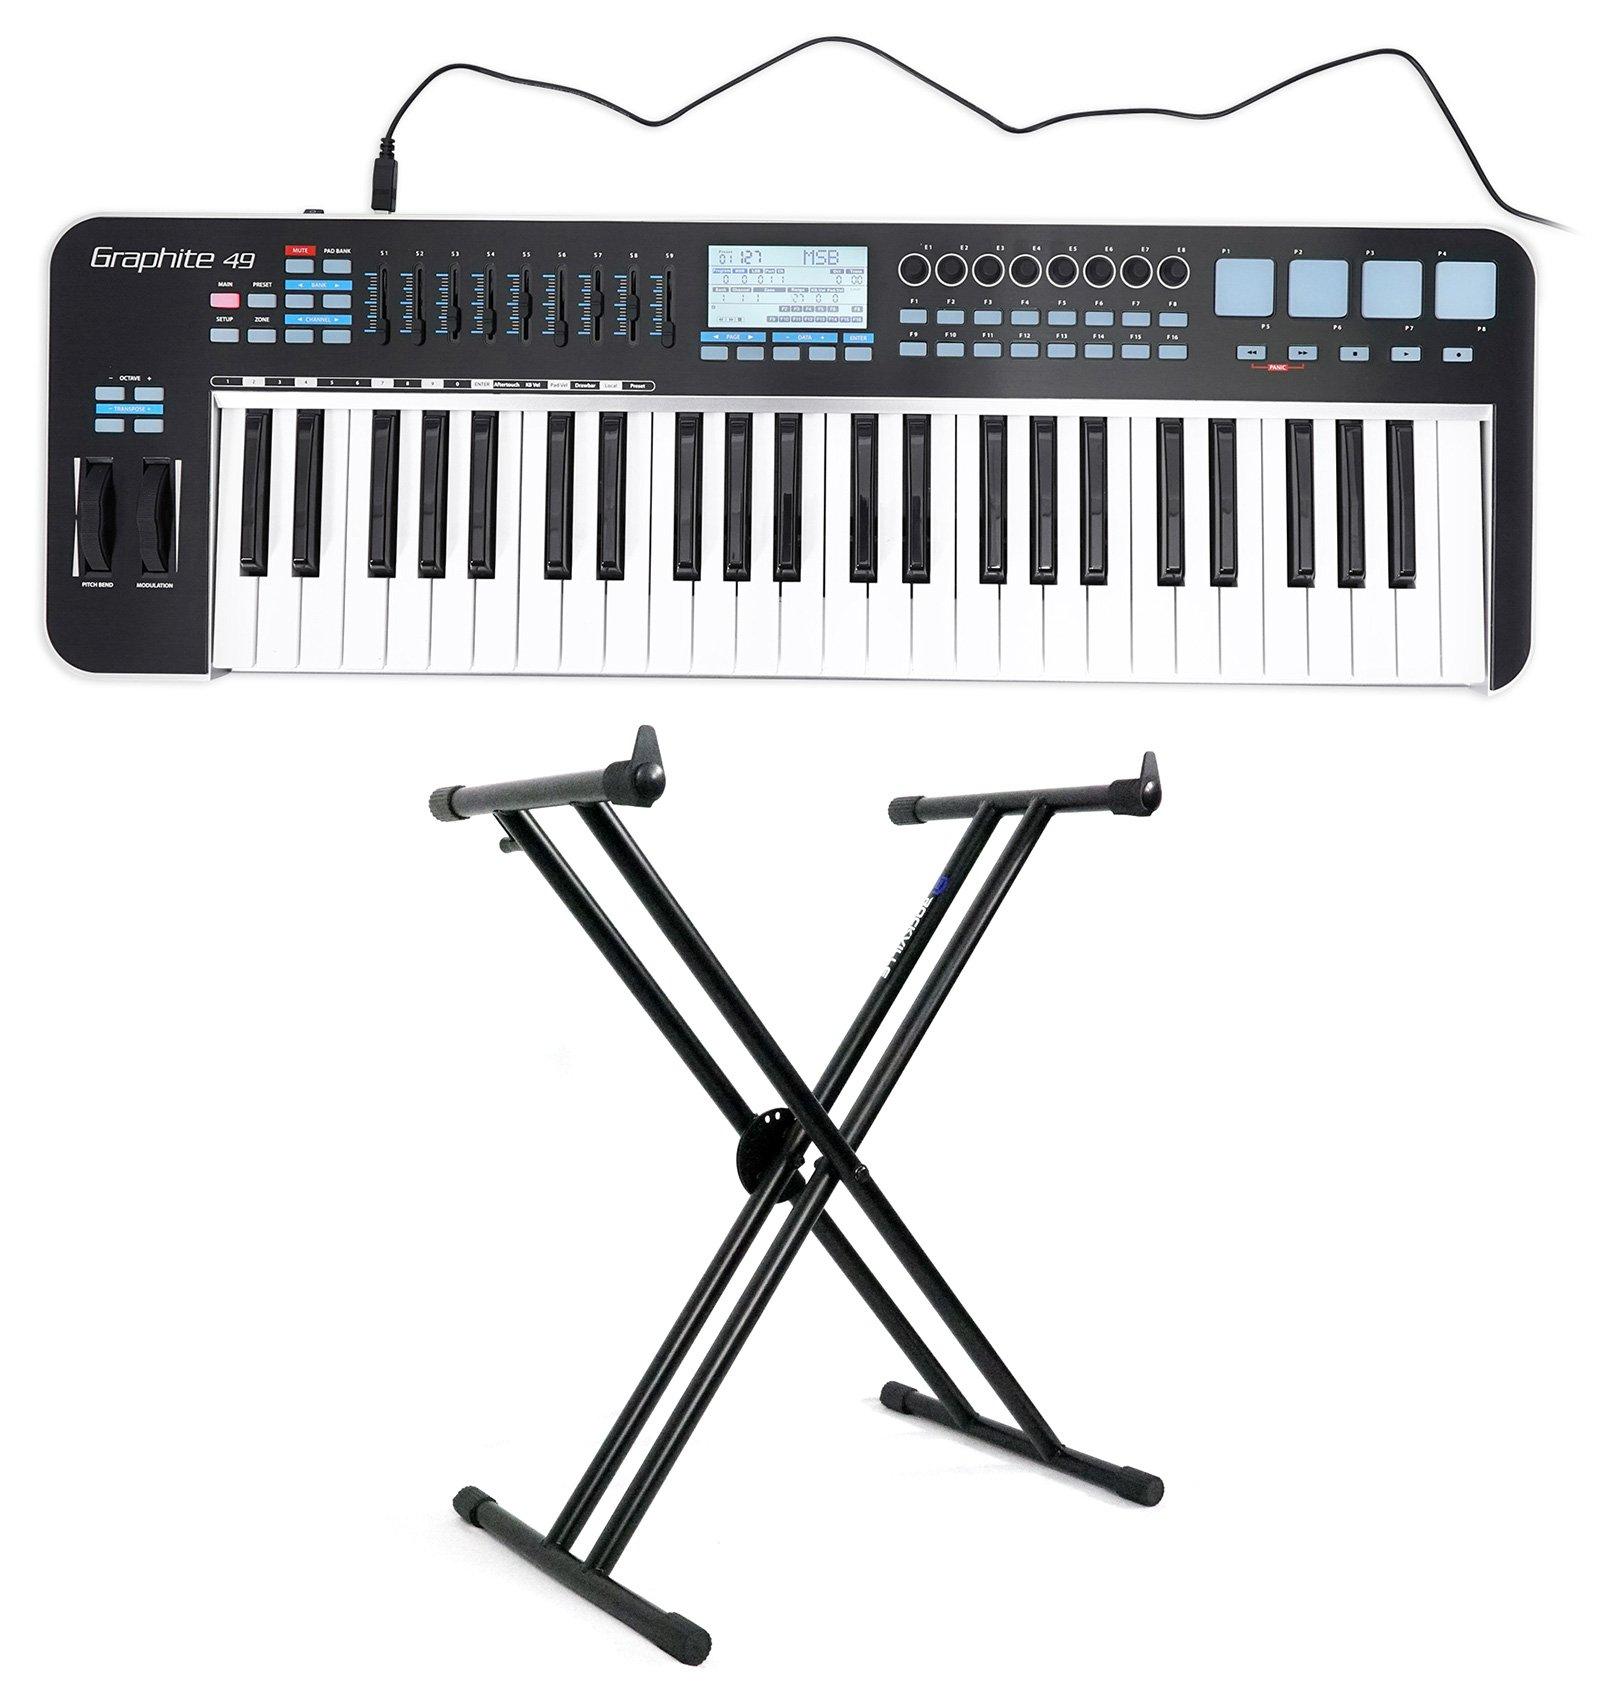 Samson Graphite 49 Key USB MIDI DJ Keyboard Controller w/Fader/Pads + Stand by Samson Technologies